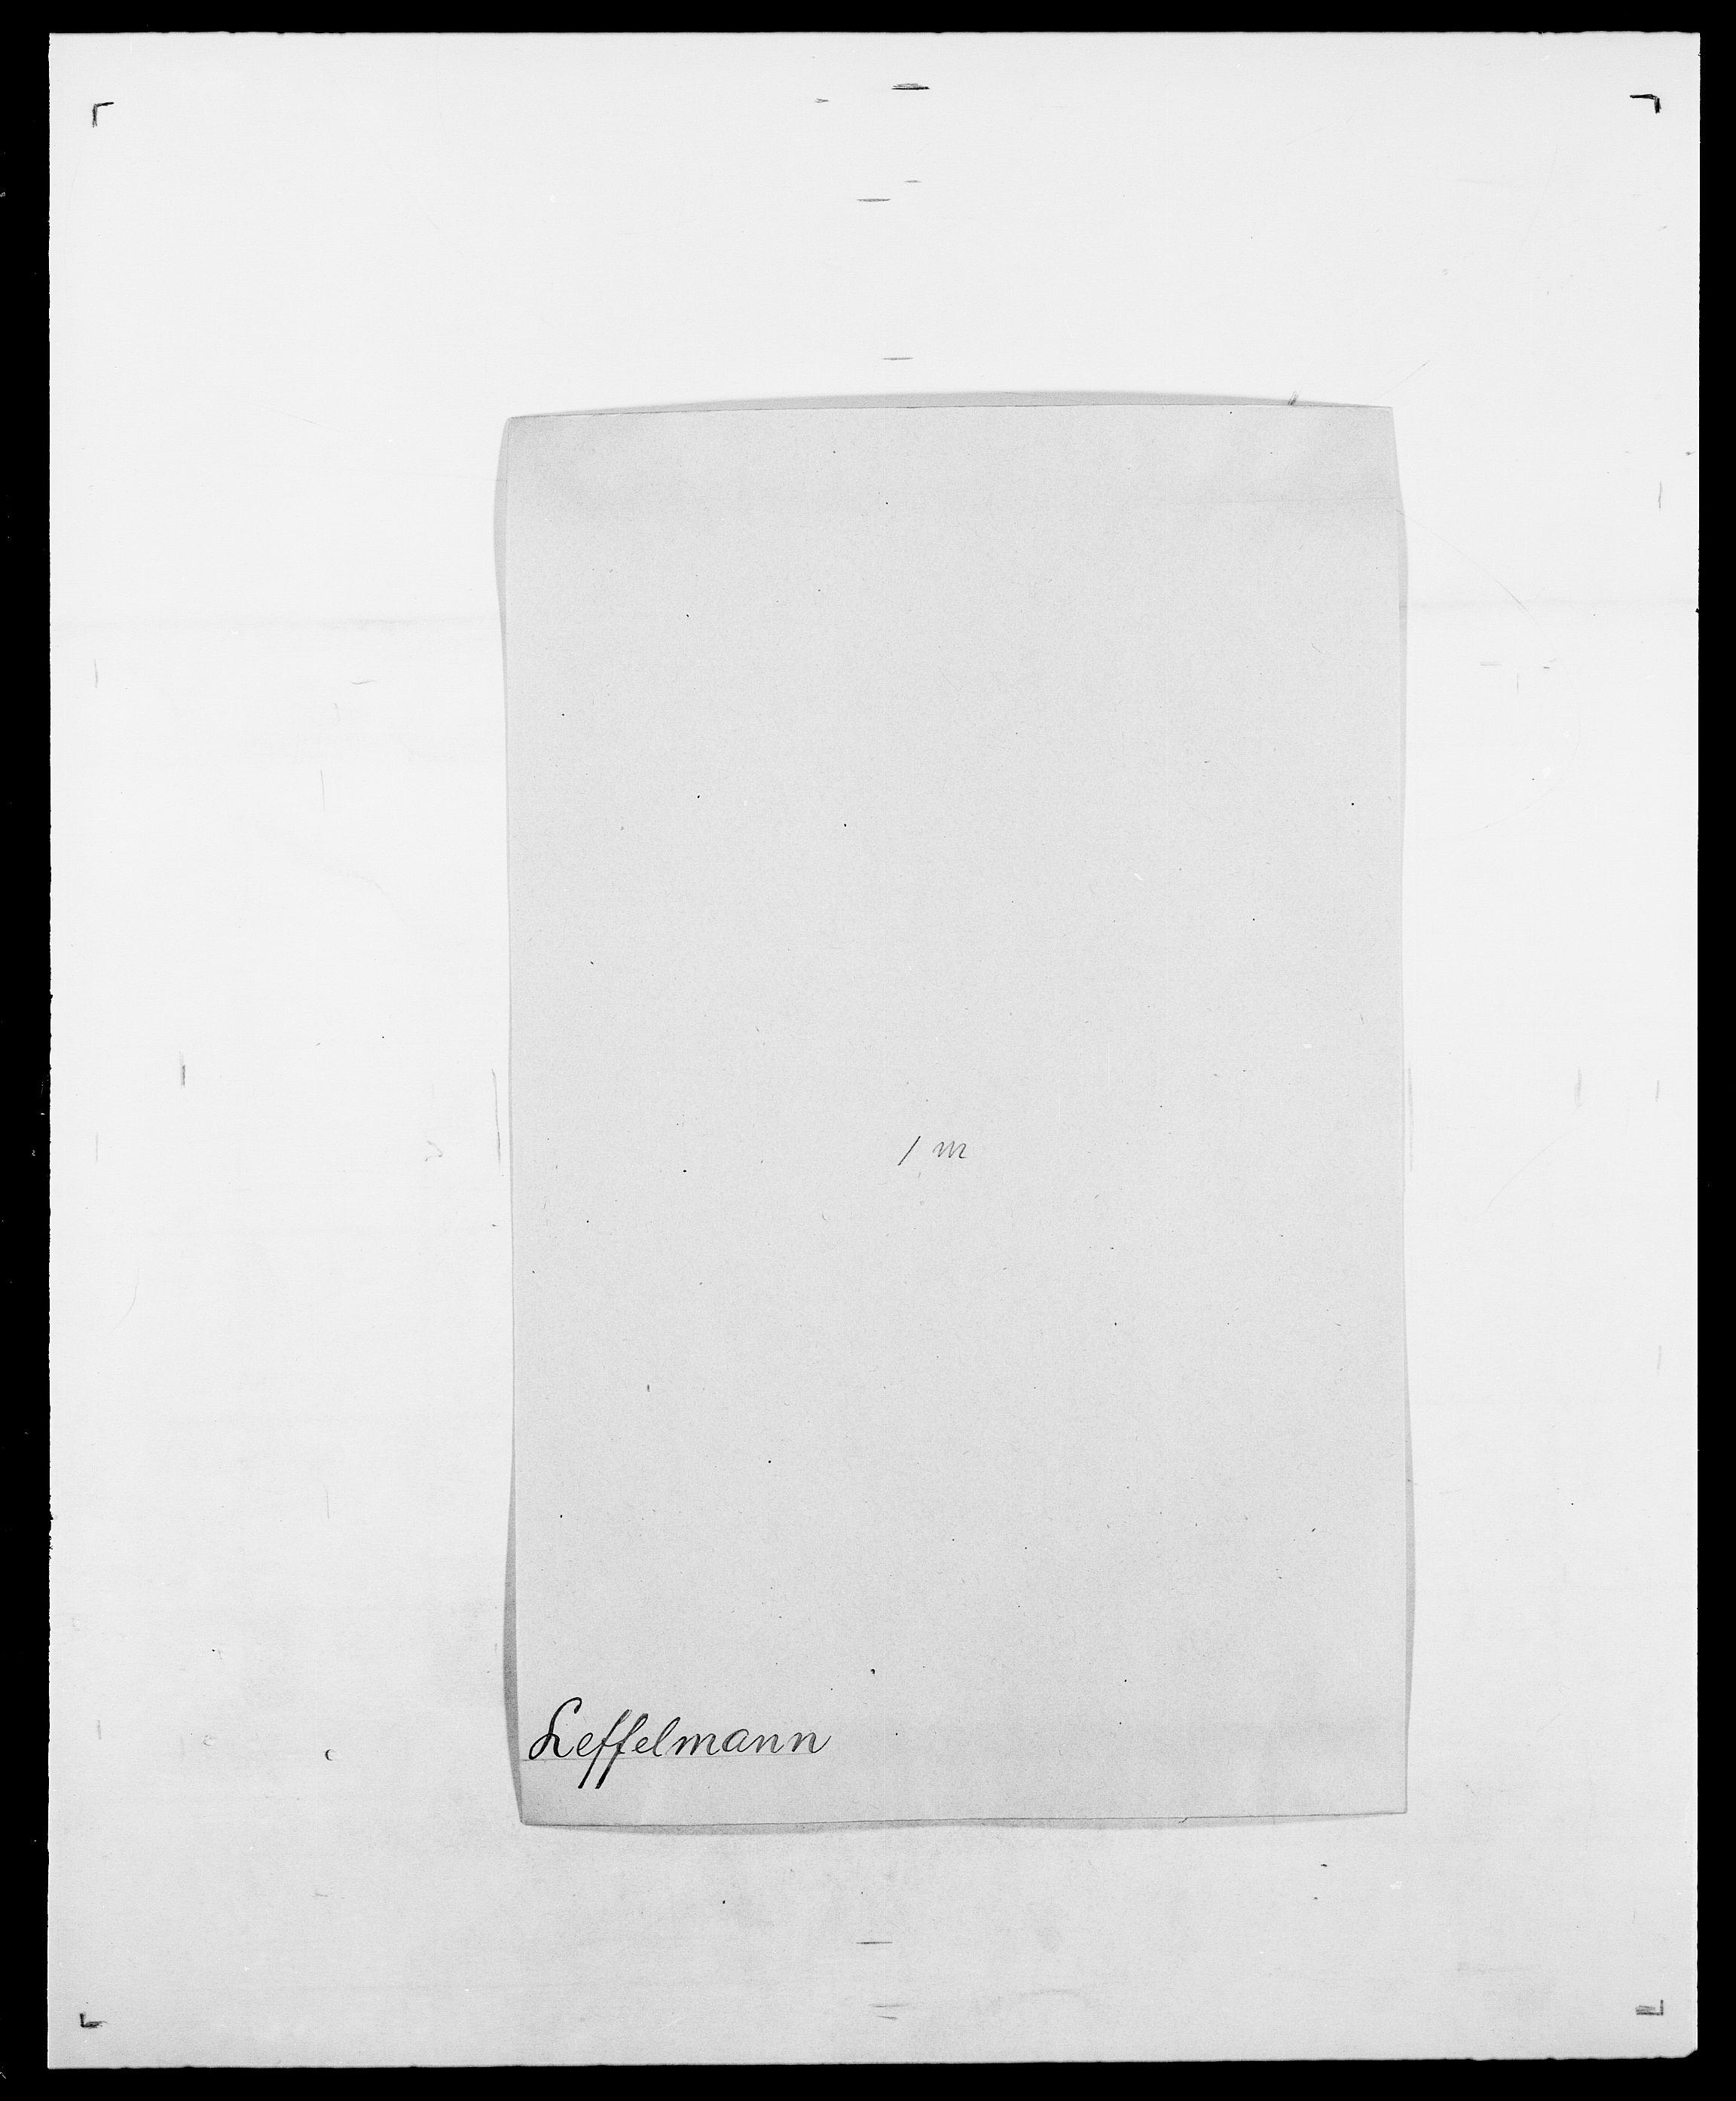 SAO, Delgobe, Charles Antoine - samling, D/Da/L0023: Lau - Lirvyn, s. 86